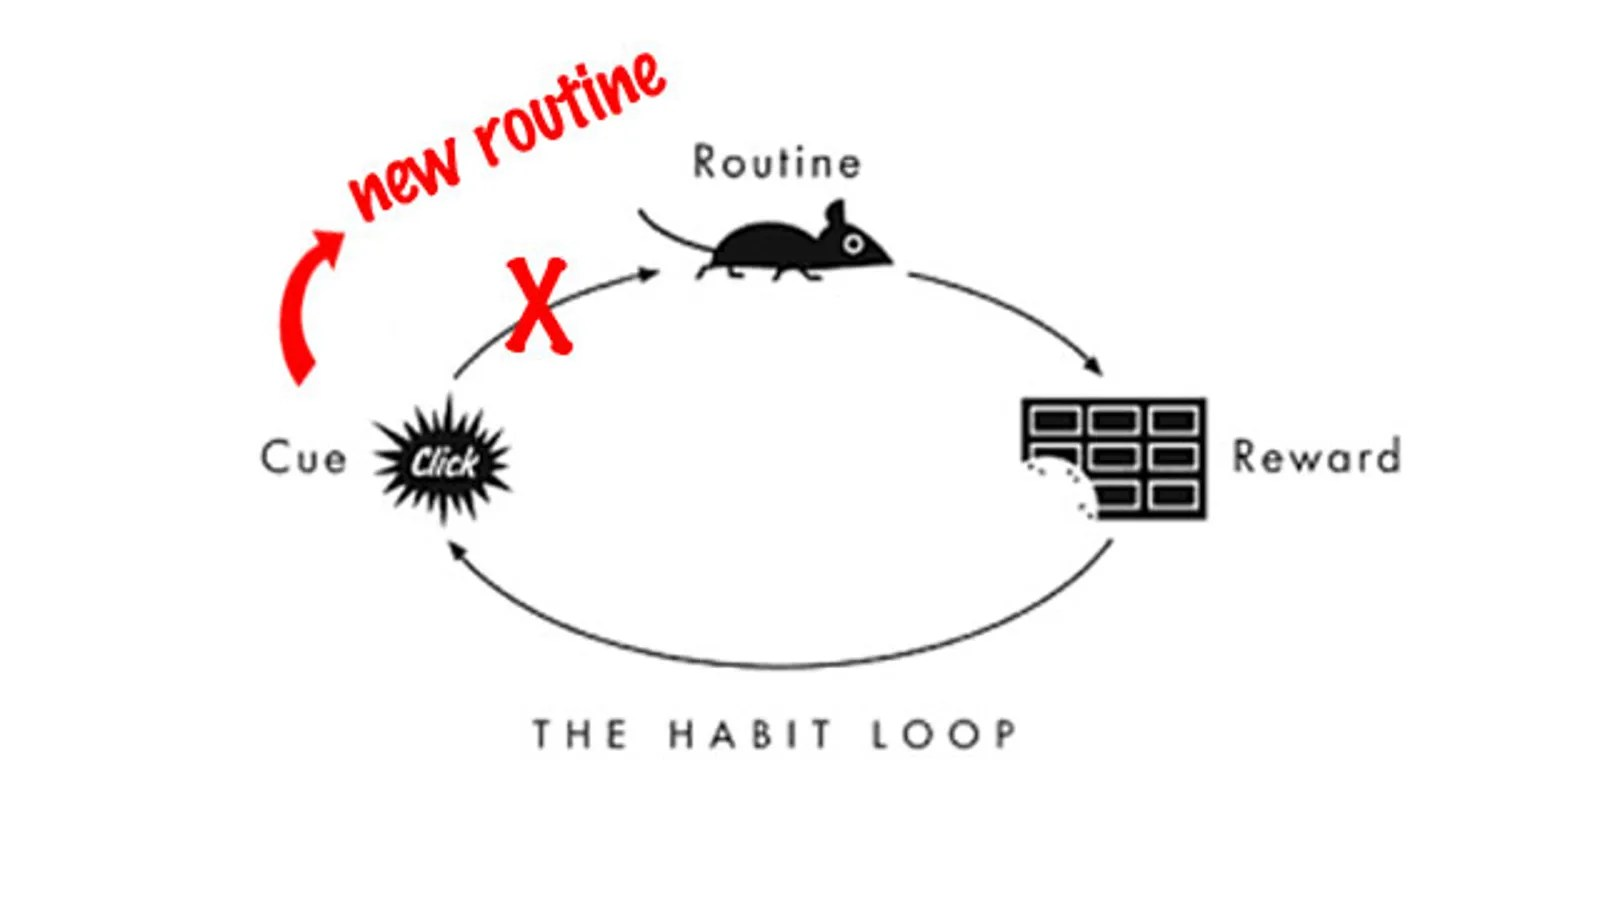 Break Bad Habits By Developing an If-Then Plan